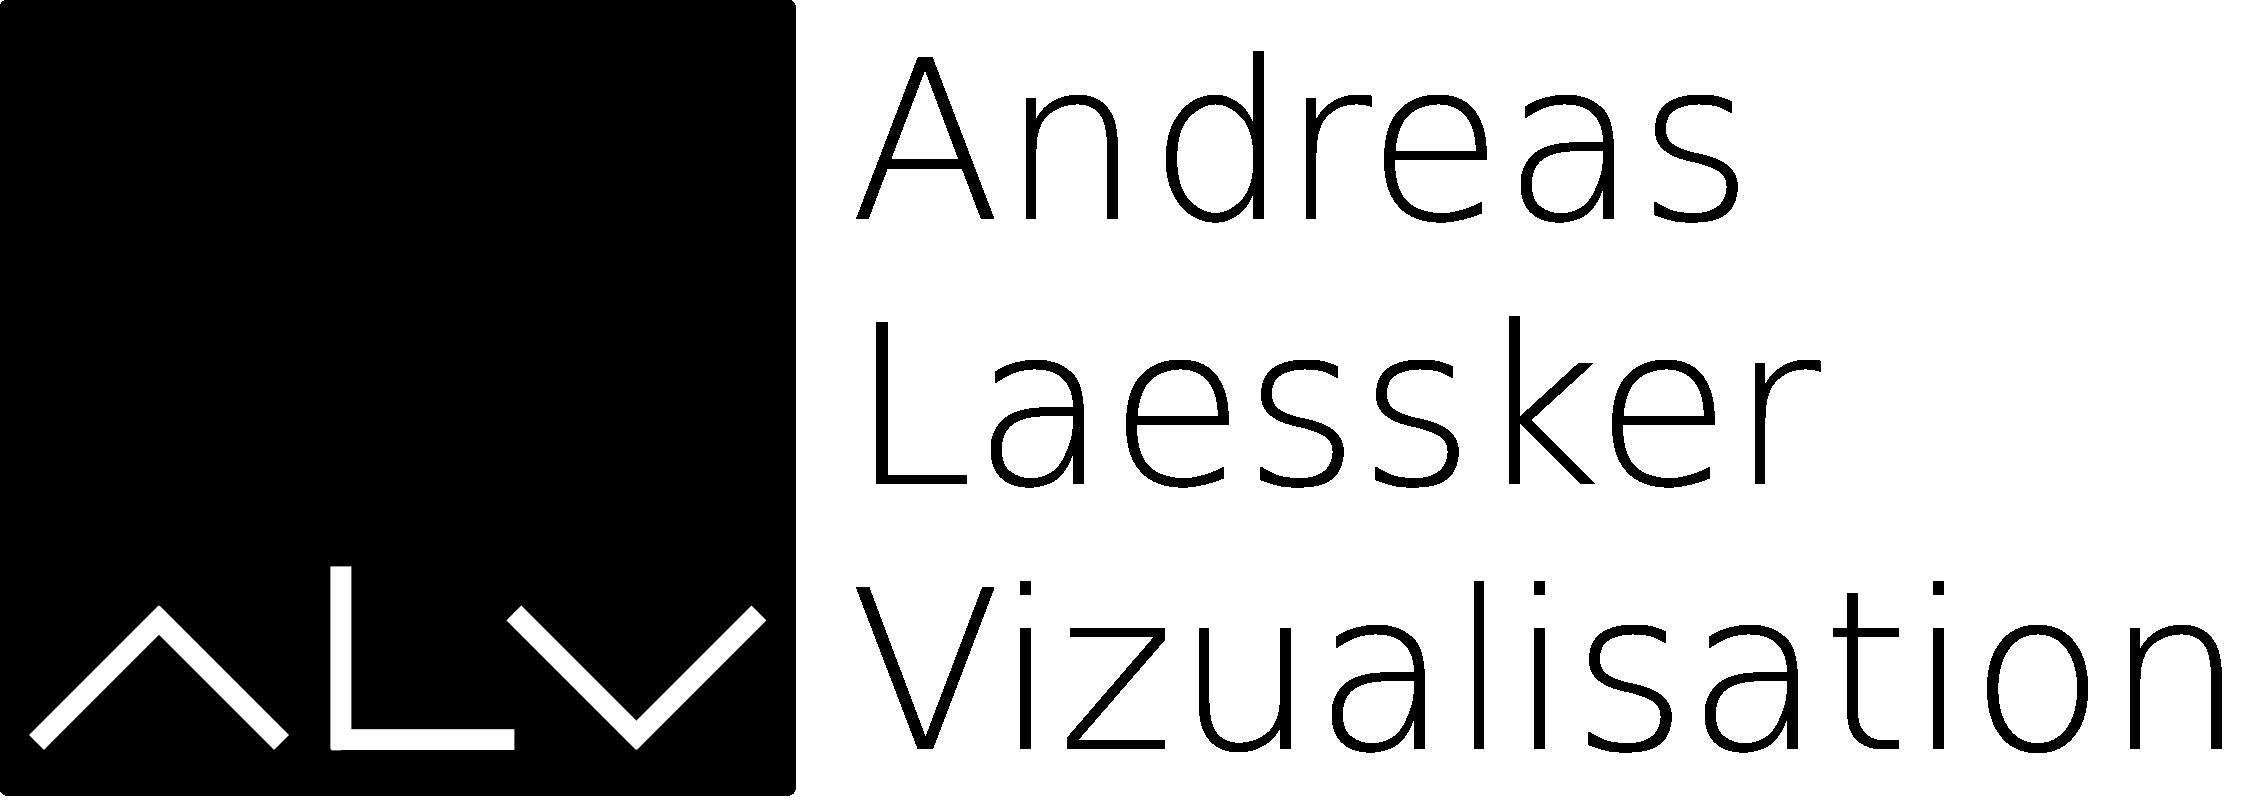 alv_logga_med_text_0.png